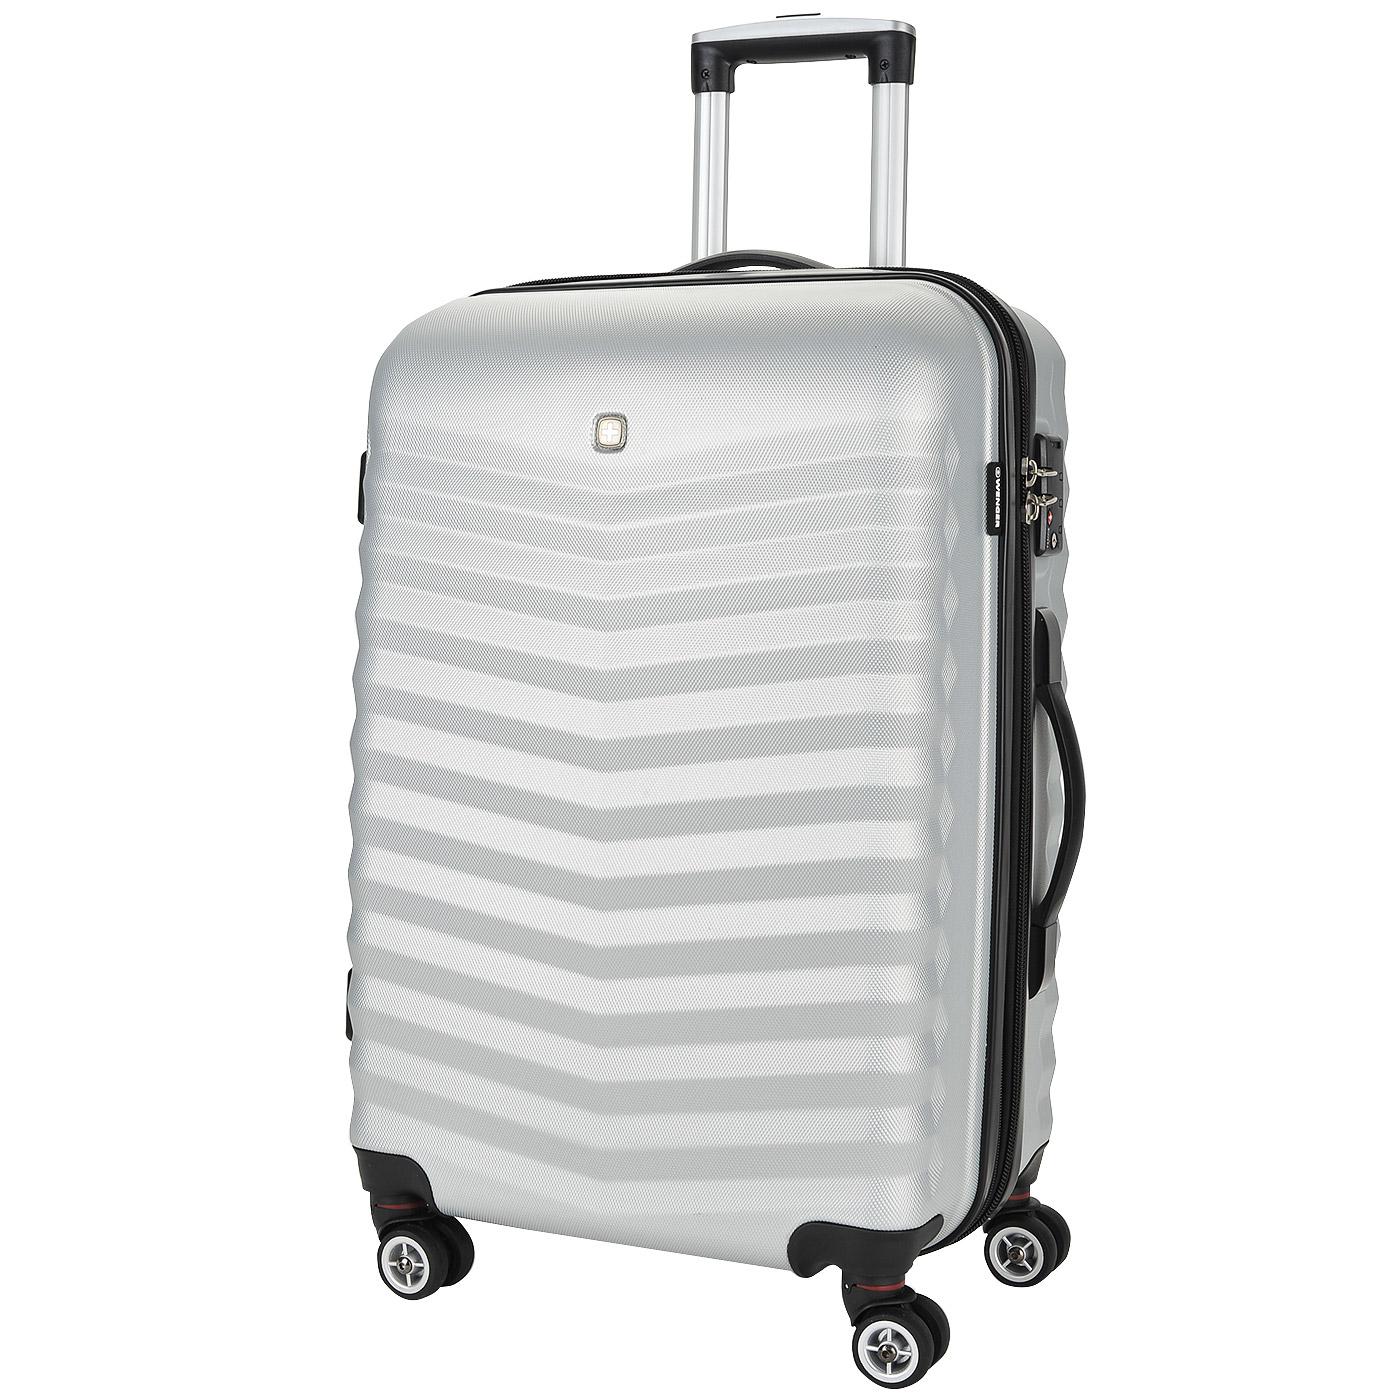 Чемодан маленький S из ABS-пластика Wenger Fribourg SW32300467 серый ... 570e7616a0c